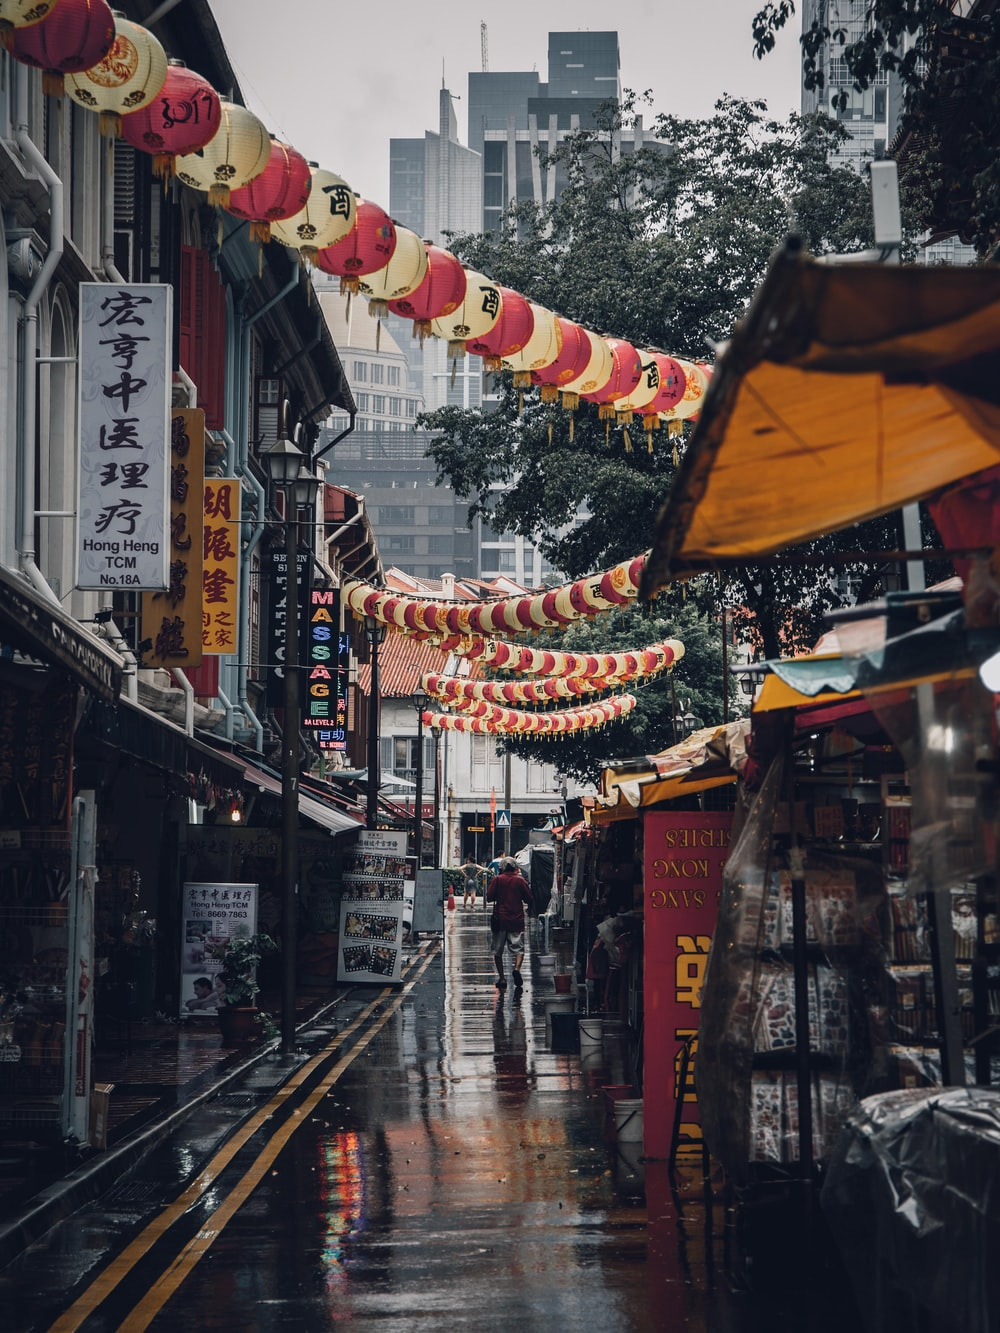 assorted lanterns hanged above alleyway